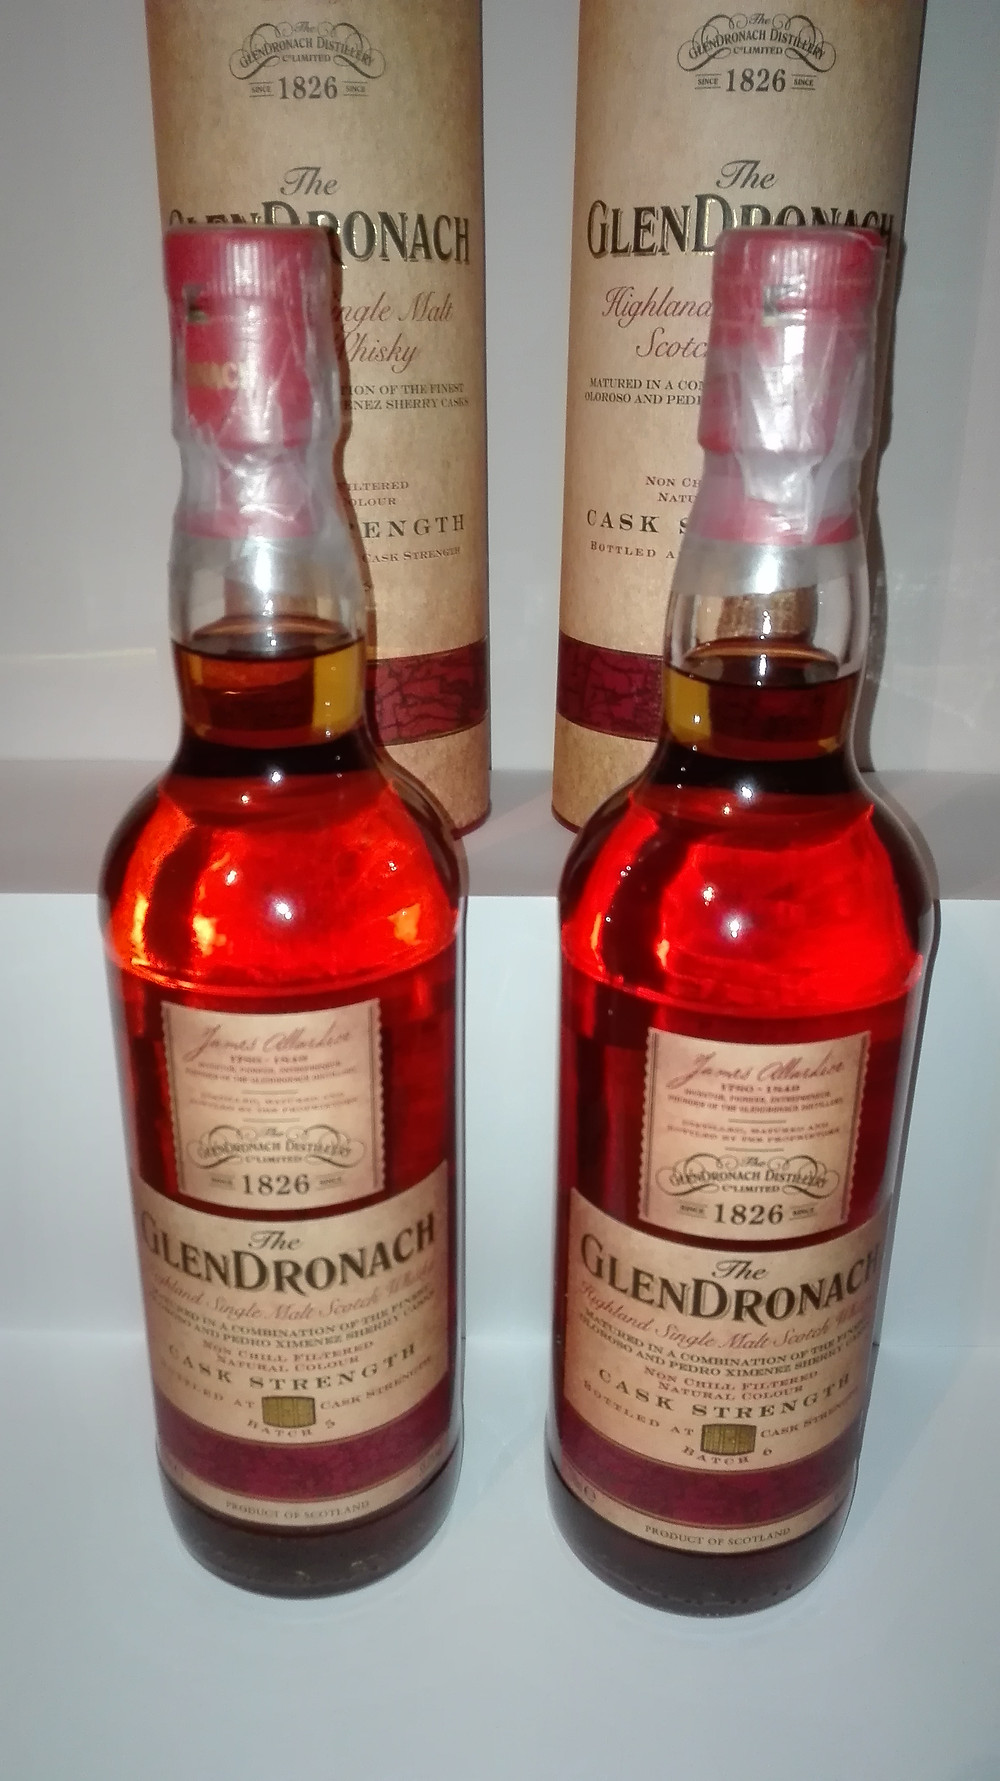 Glendronach, Glendronach 12, Glendronach 18, Allardice, Parliament, Glendronach 21, Glendronach Alter, älter, Produktionspause